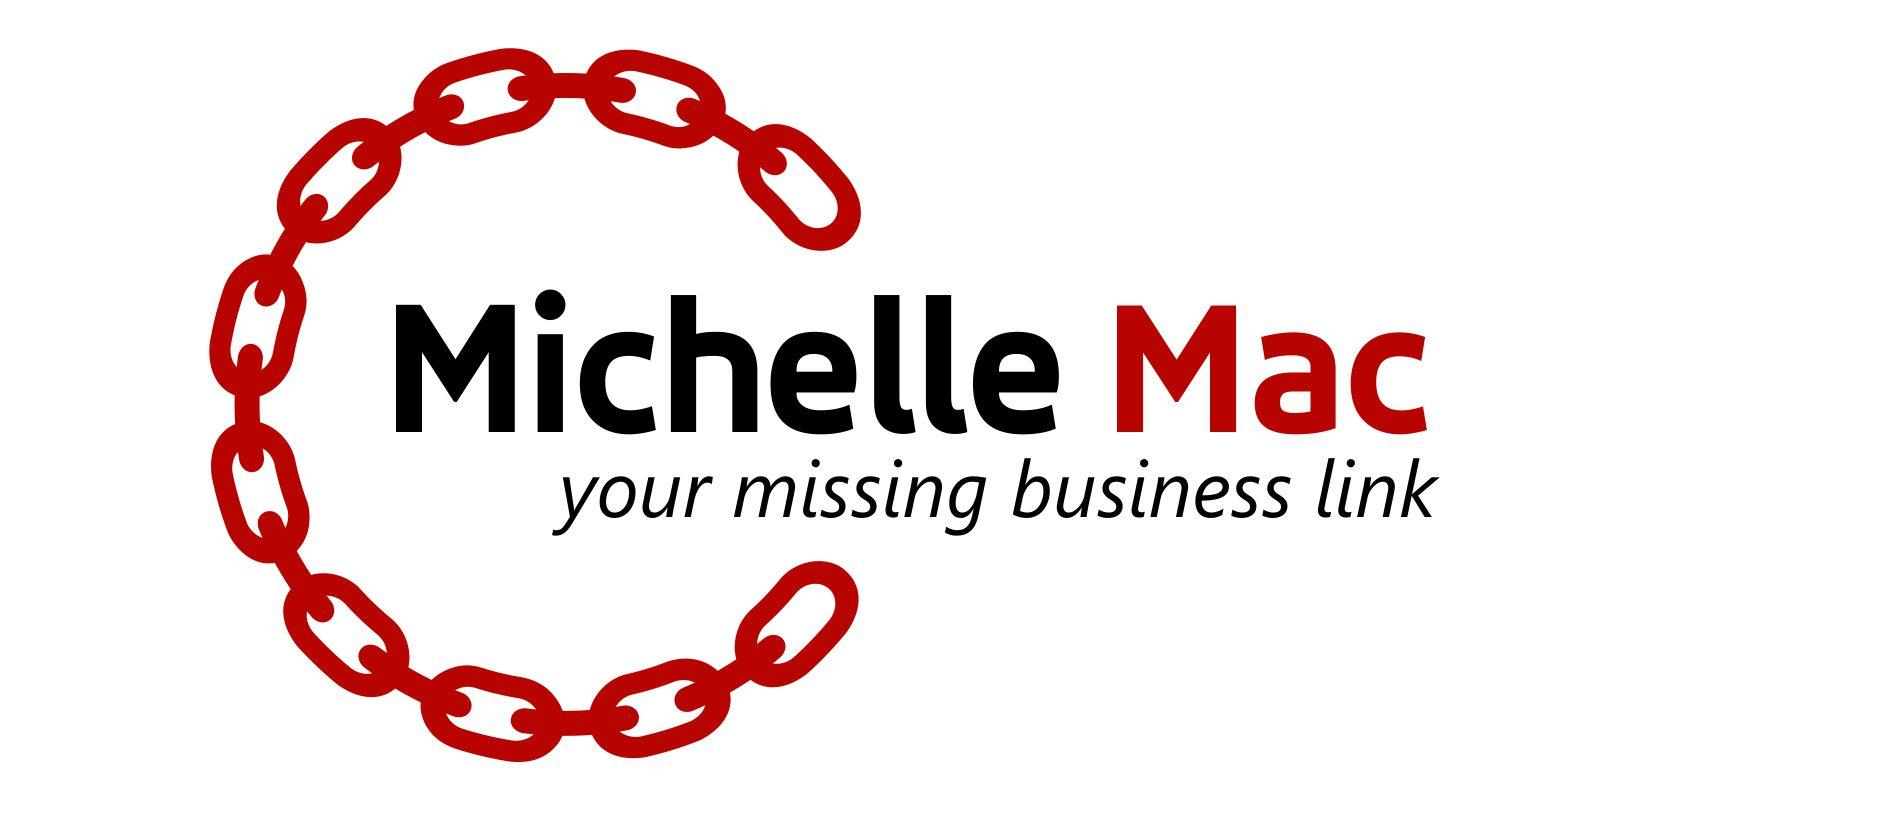 Michelle Mac